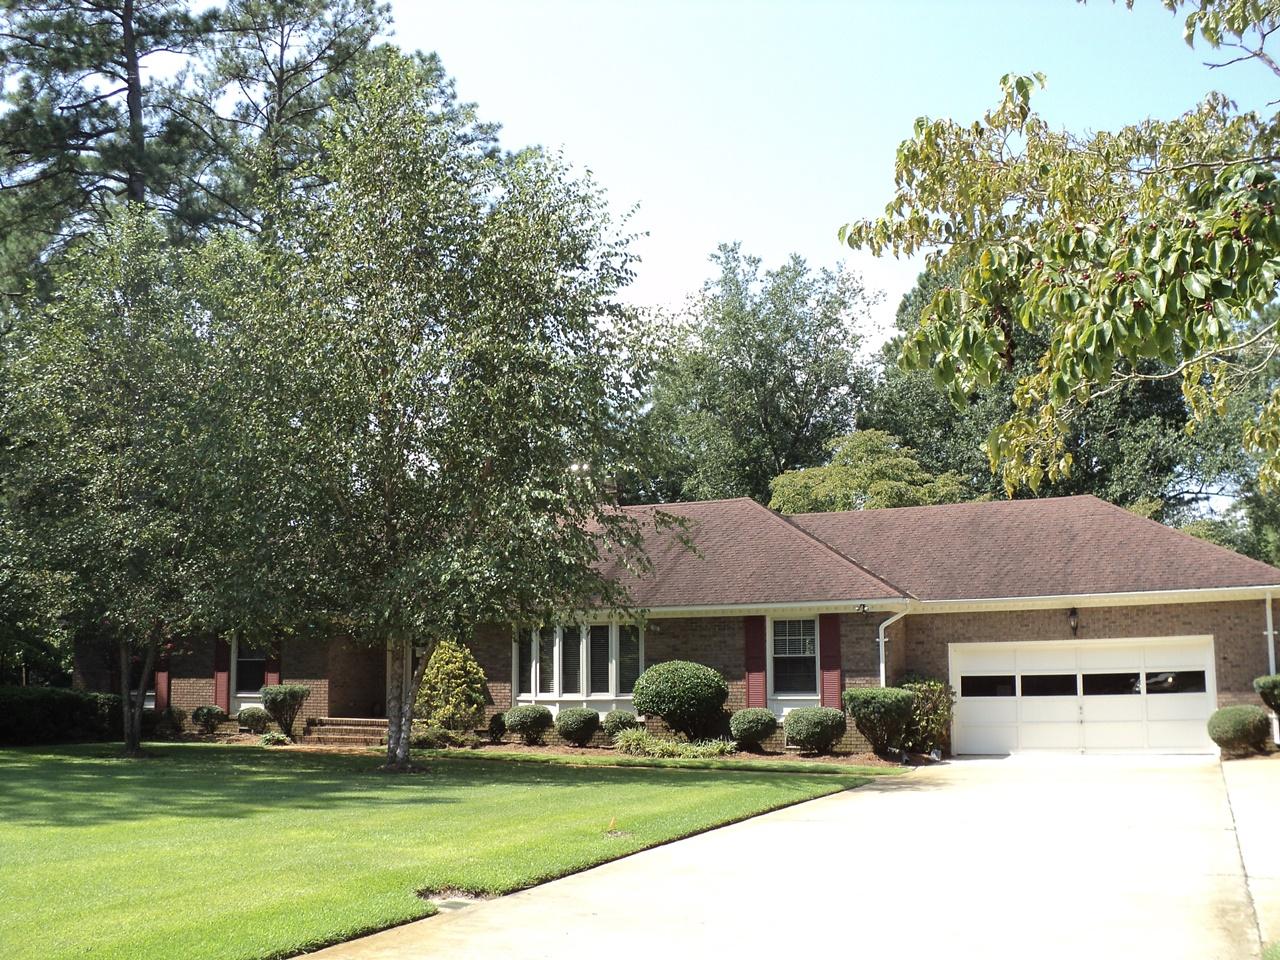 130 FAIRWAY DR, Washington, North Carolina 27889